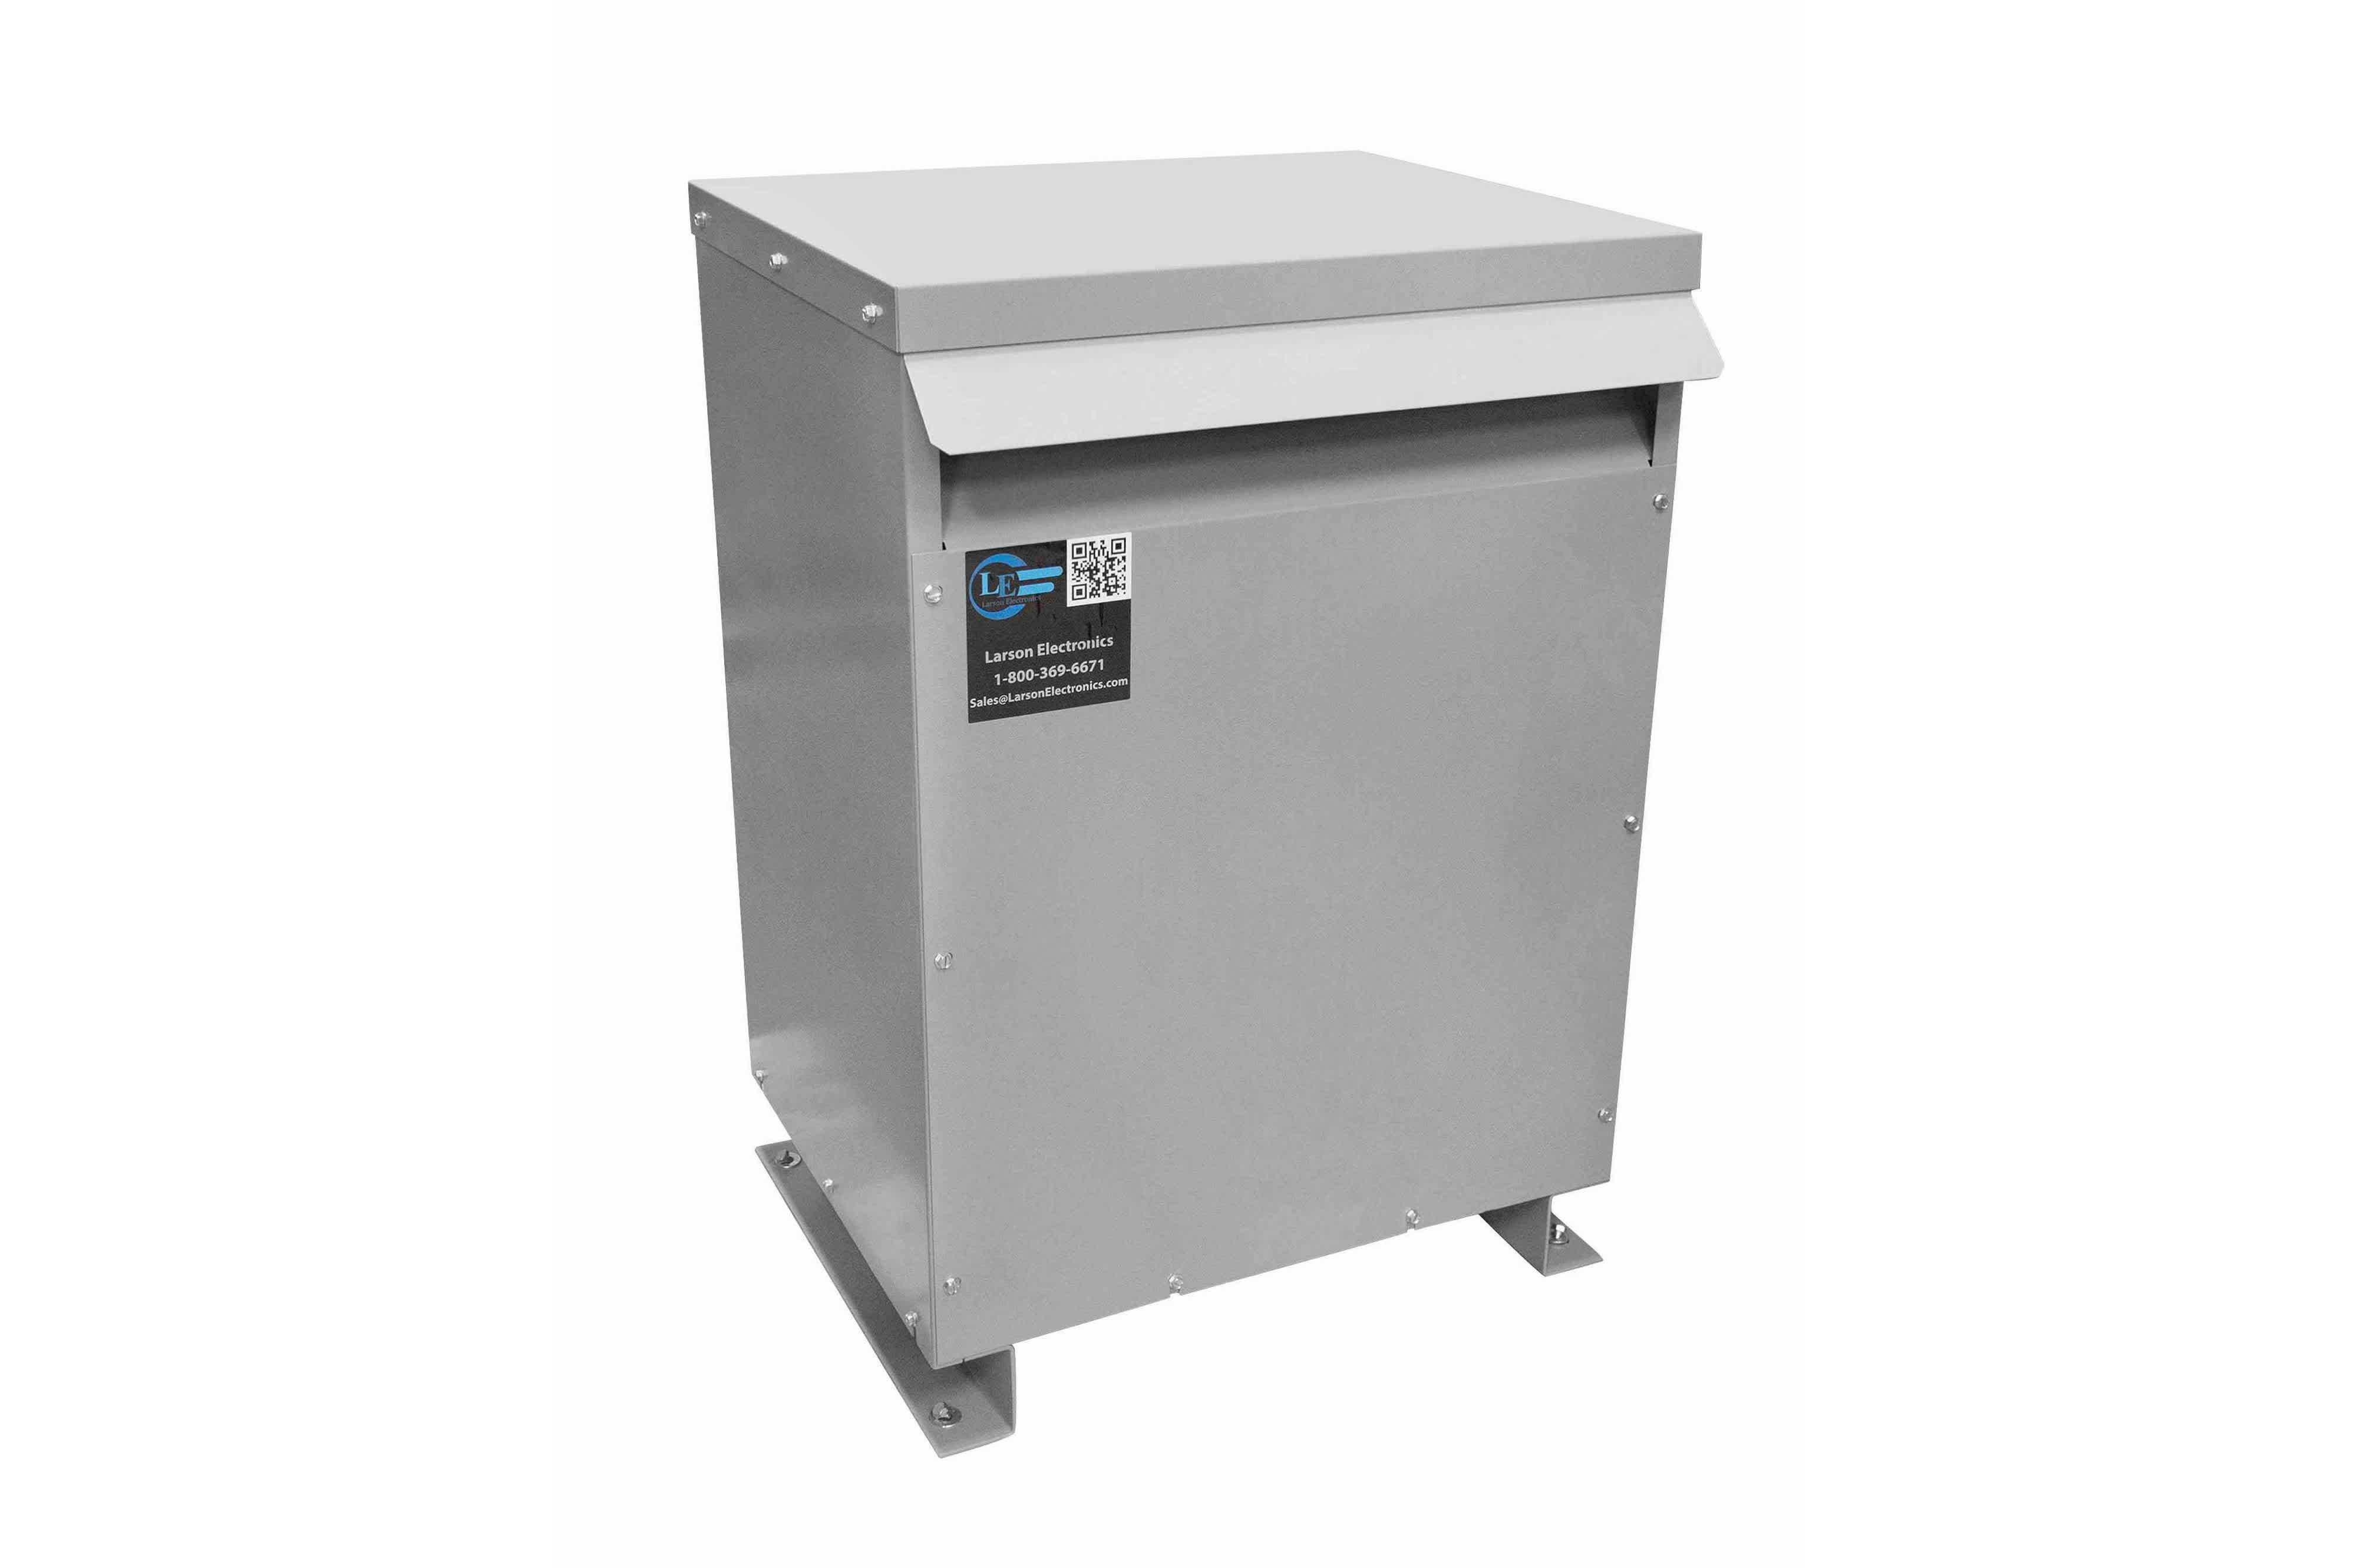 50 kVA 3PH Isolation Transformer, 575V Wye Primary, 415Y/240 Wye-N Secondary, N3R, Ventilated, 60 Hz